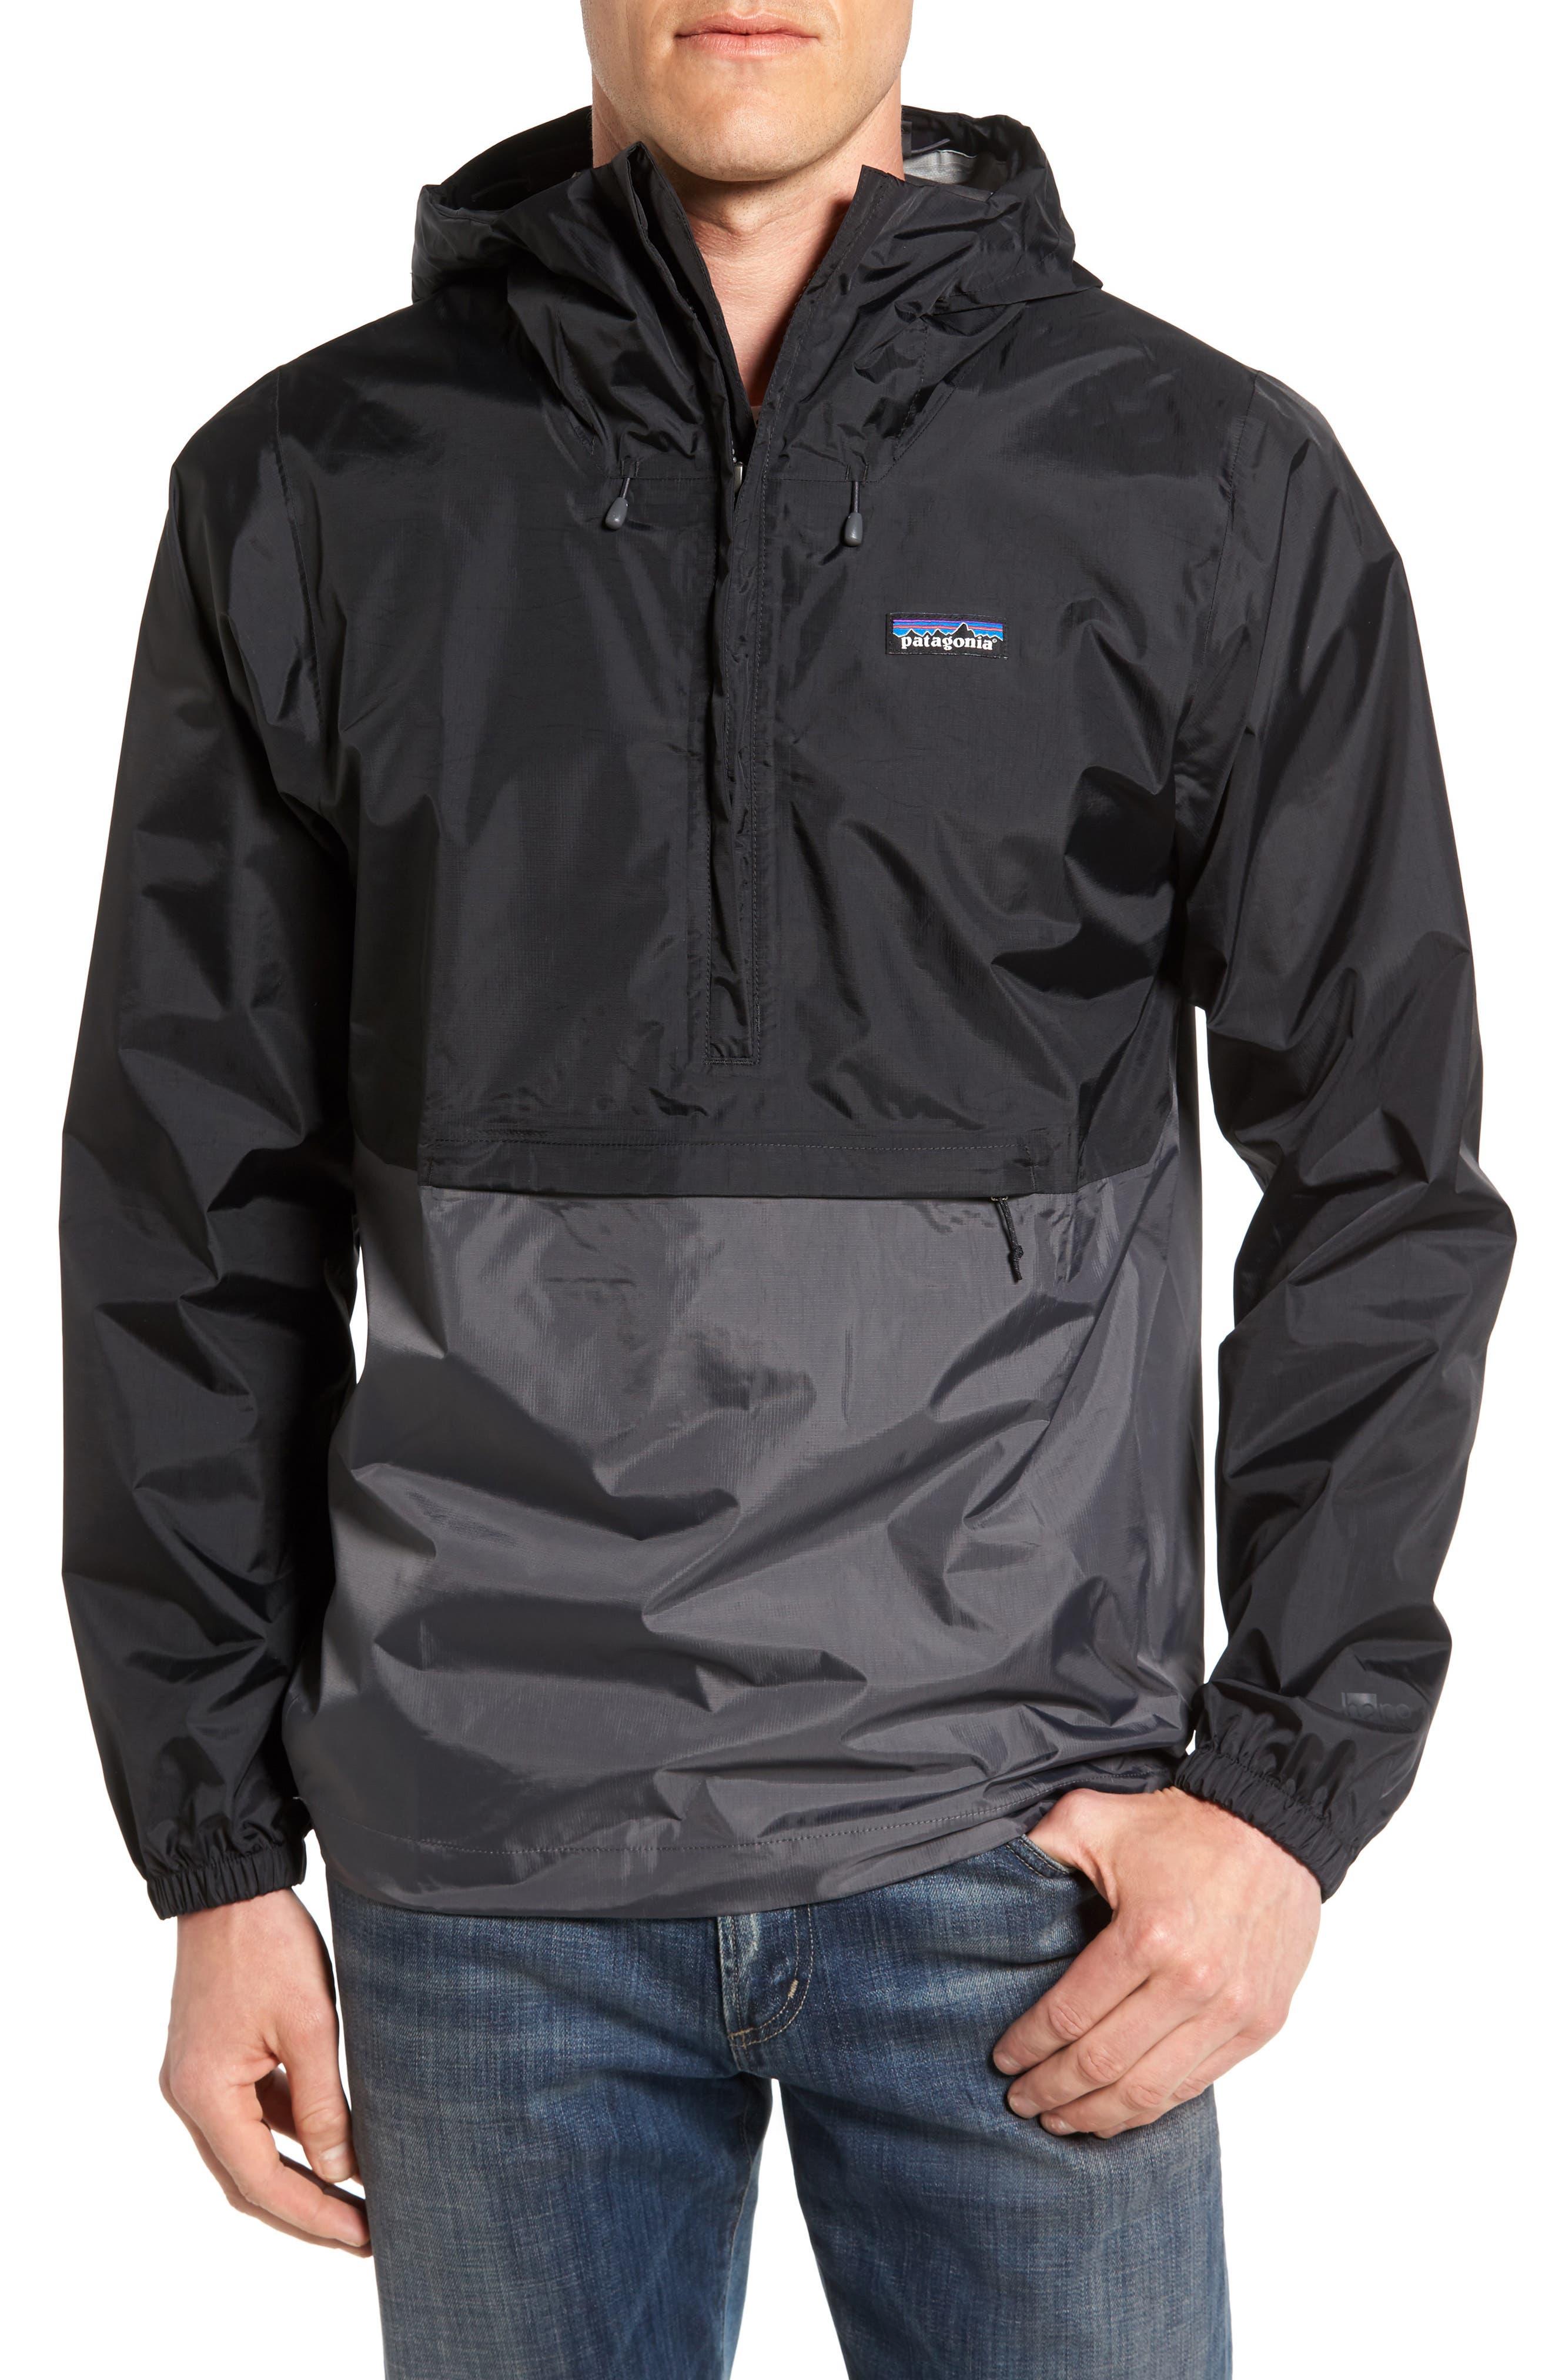 Alternate Image 1 Selected - Patagonia Torrentshell Packable Regular Fit Rain Jacket